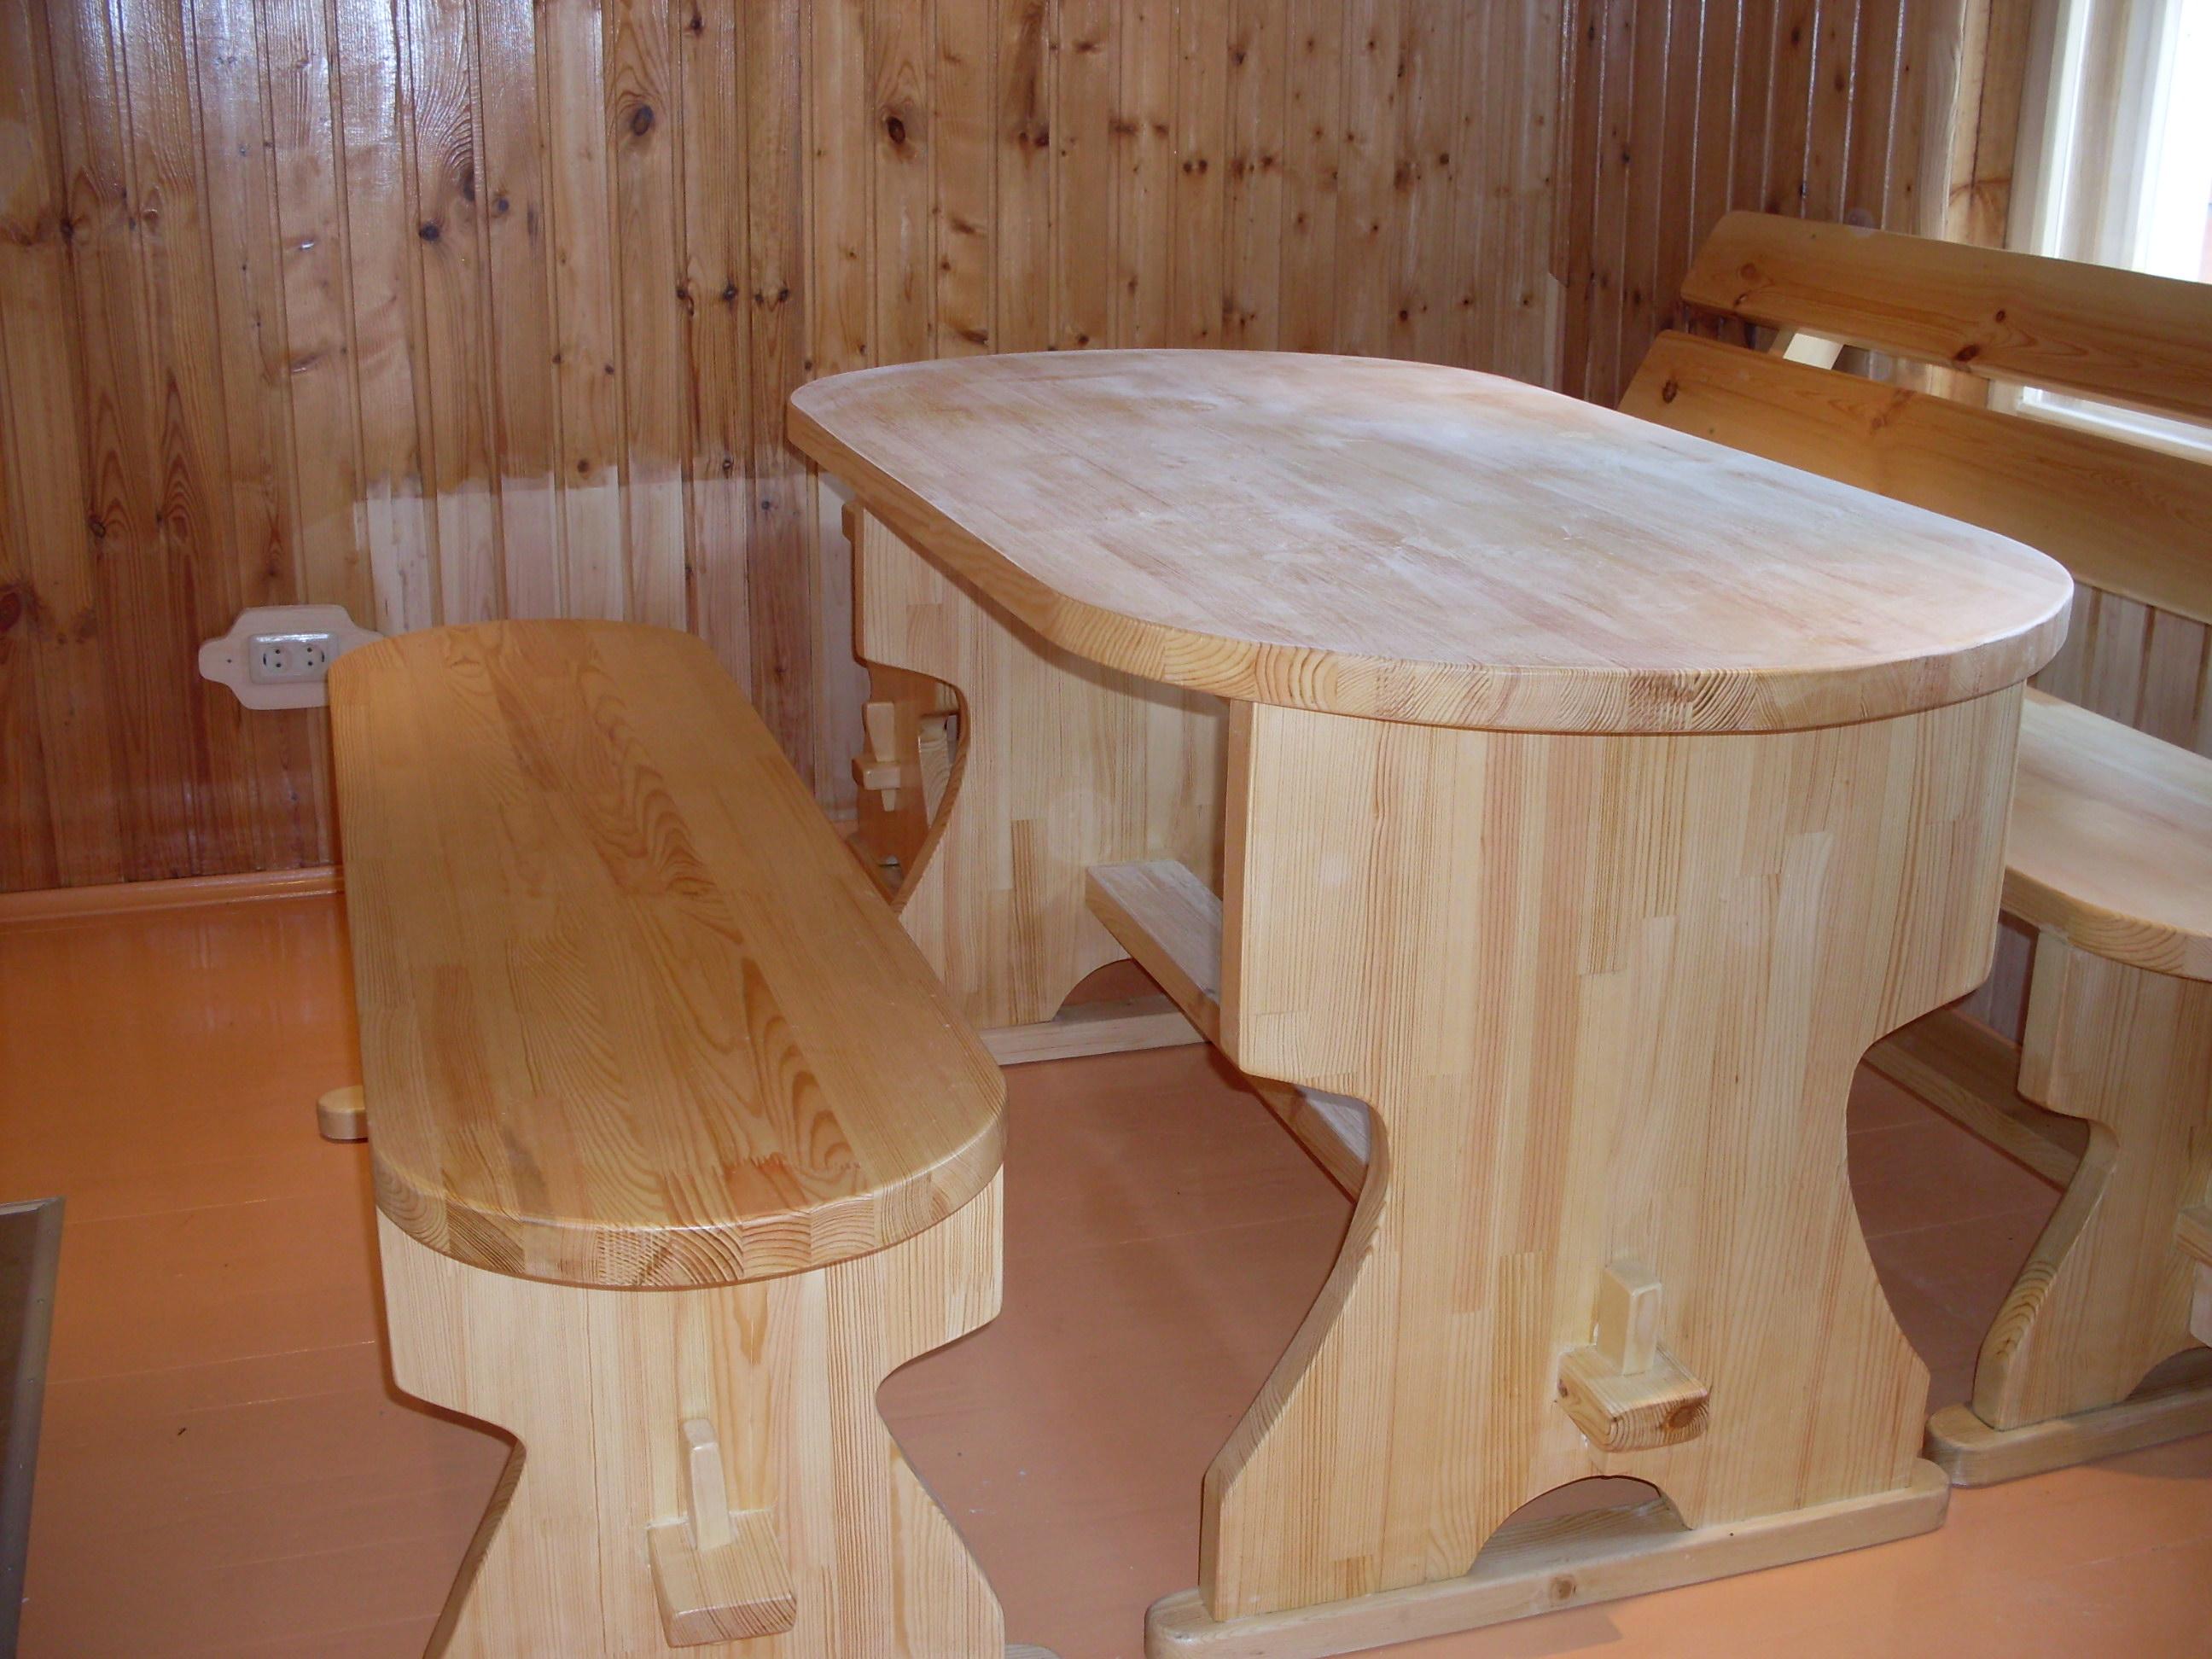 Столики для бани своими руками